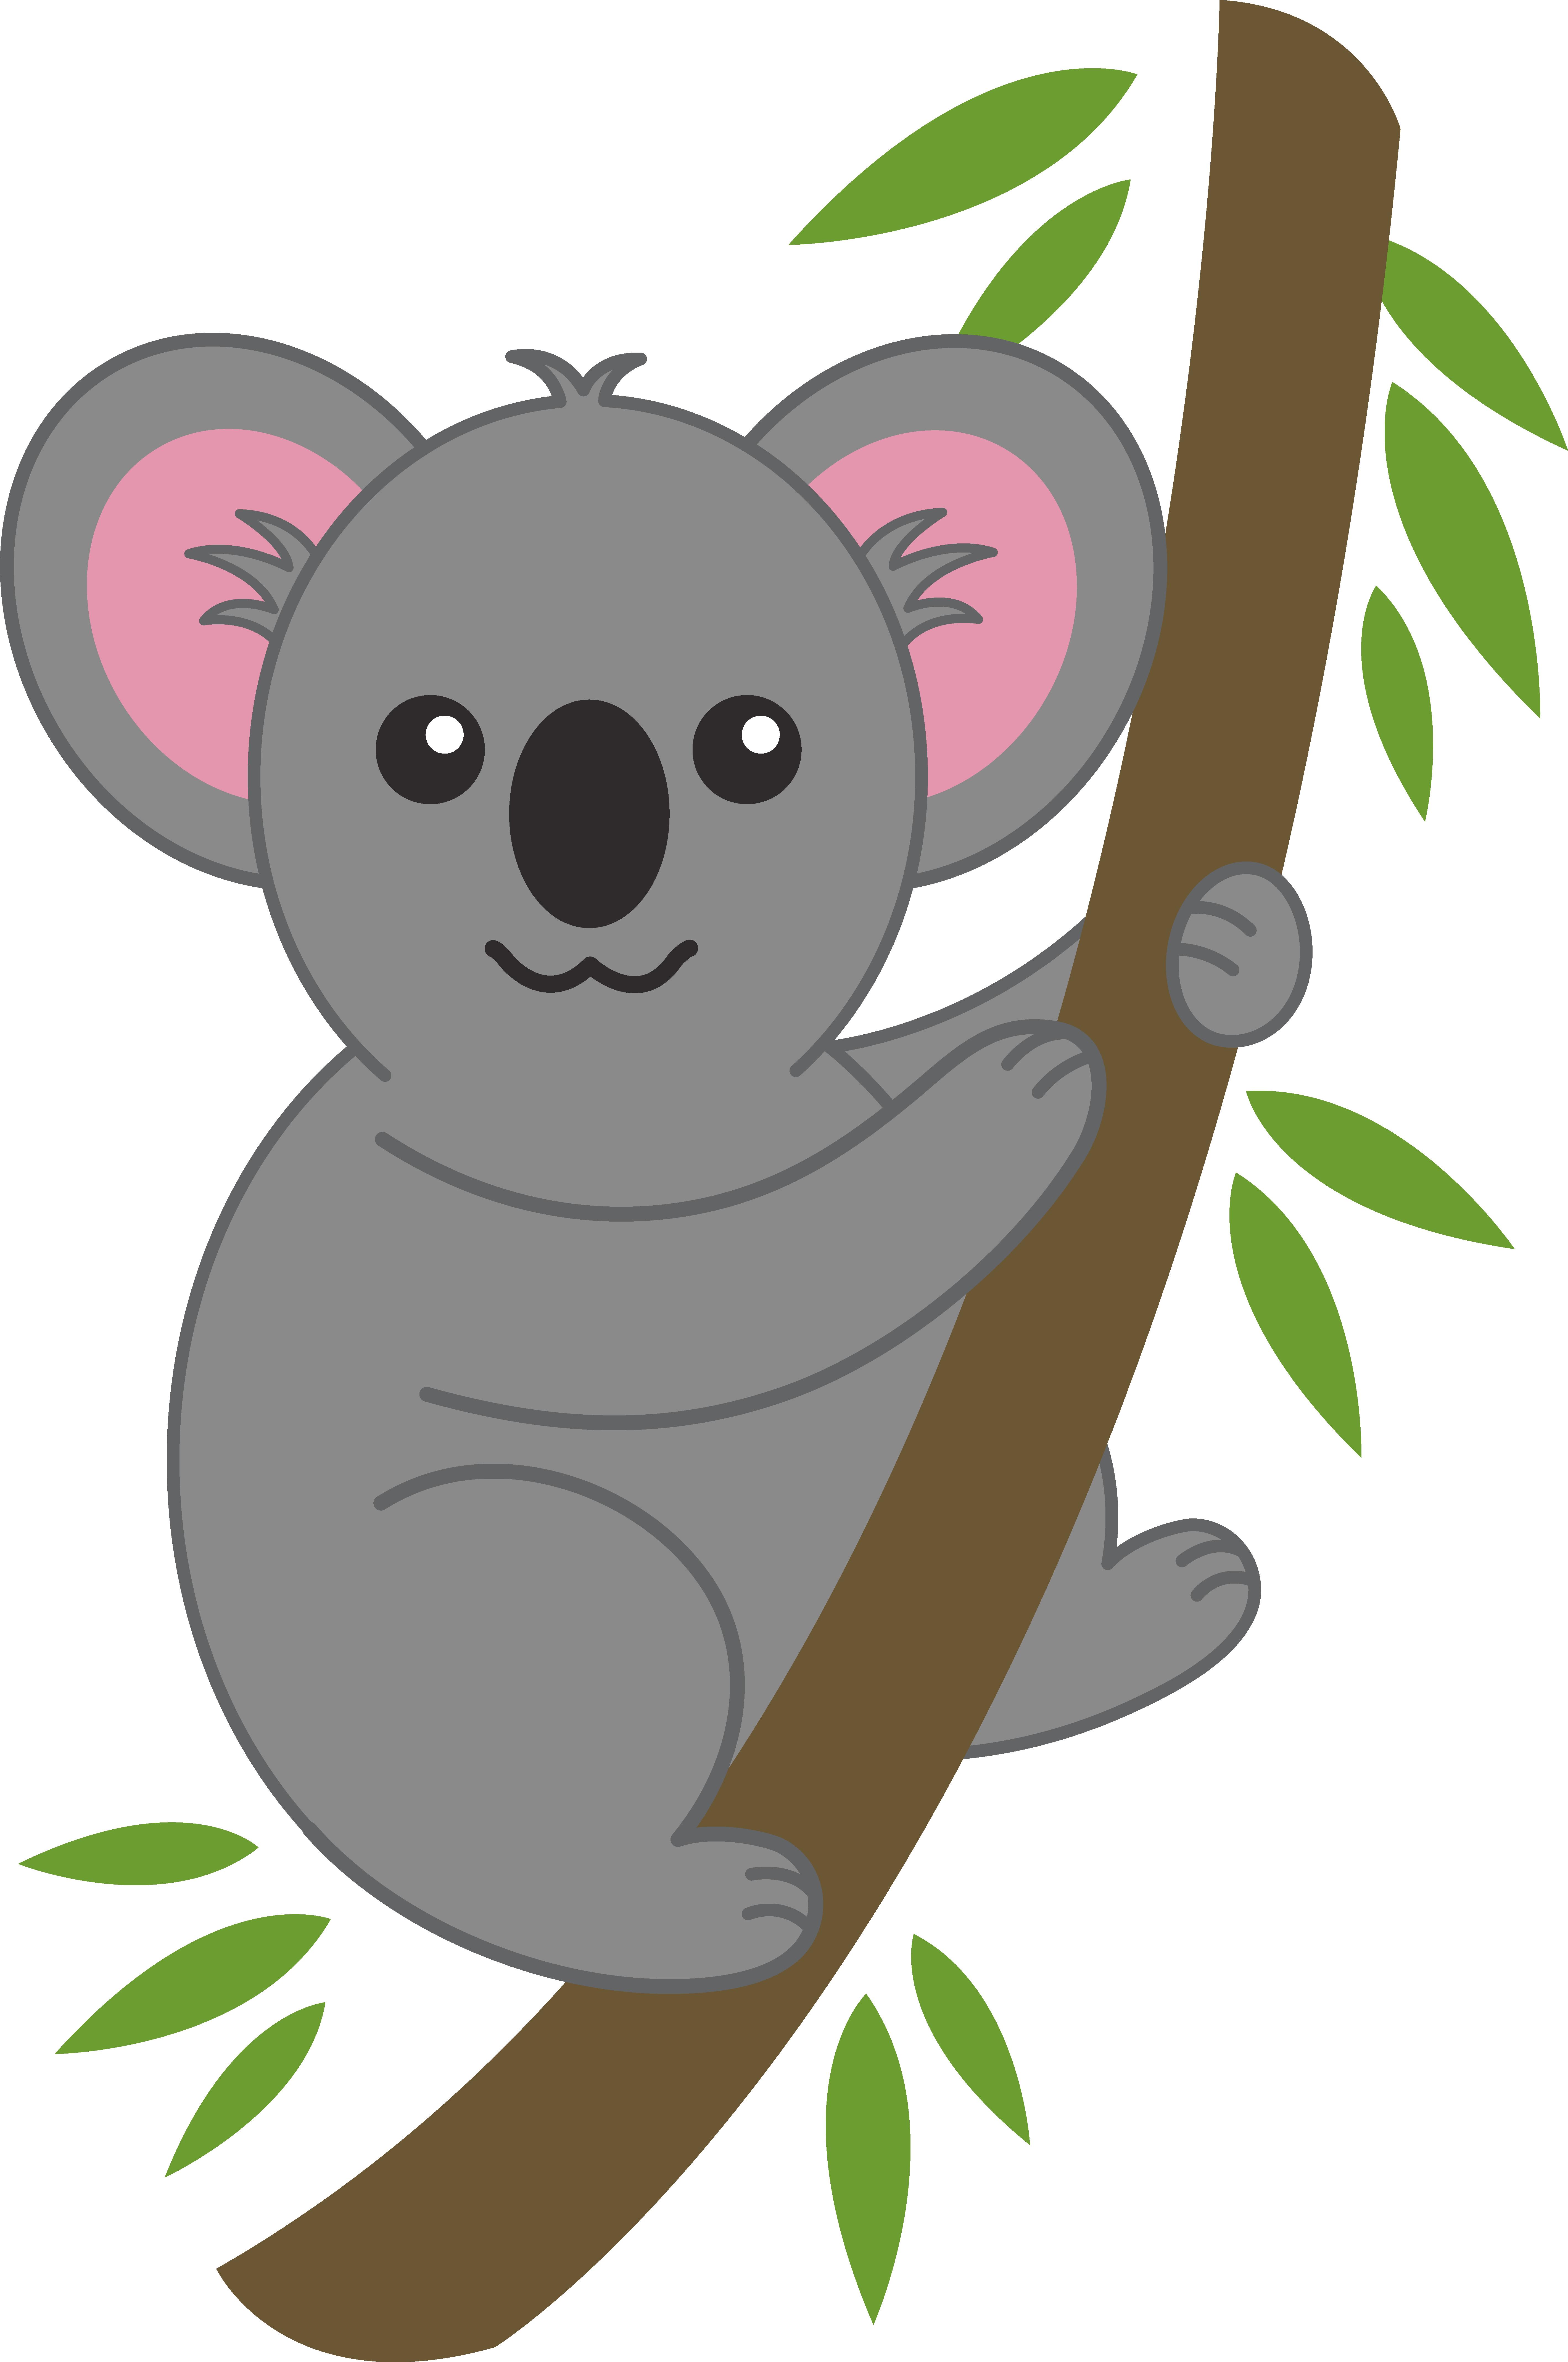 clip art black and white Koala clipart. Cute on tree branch